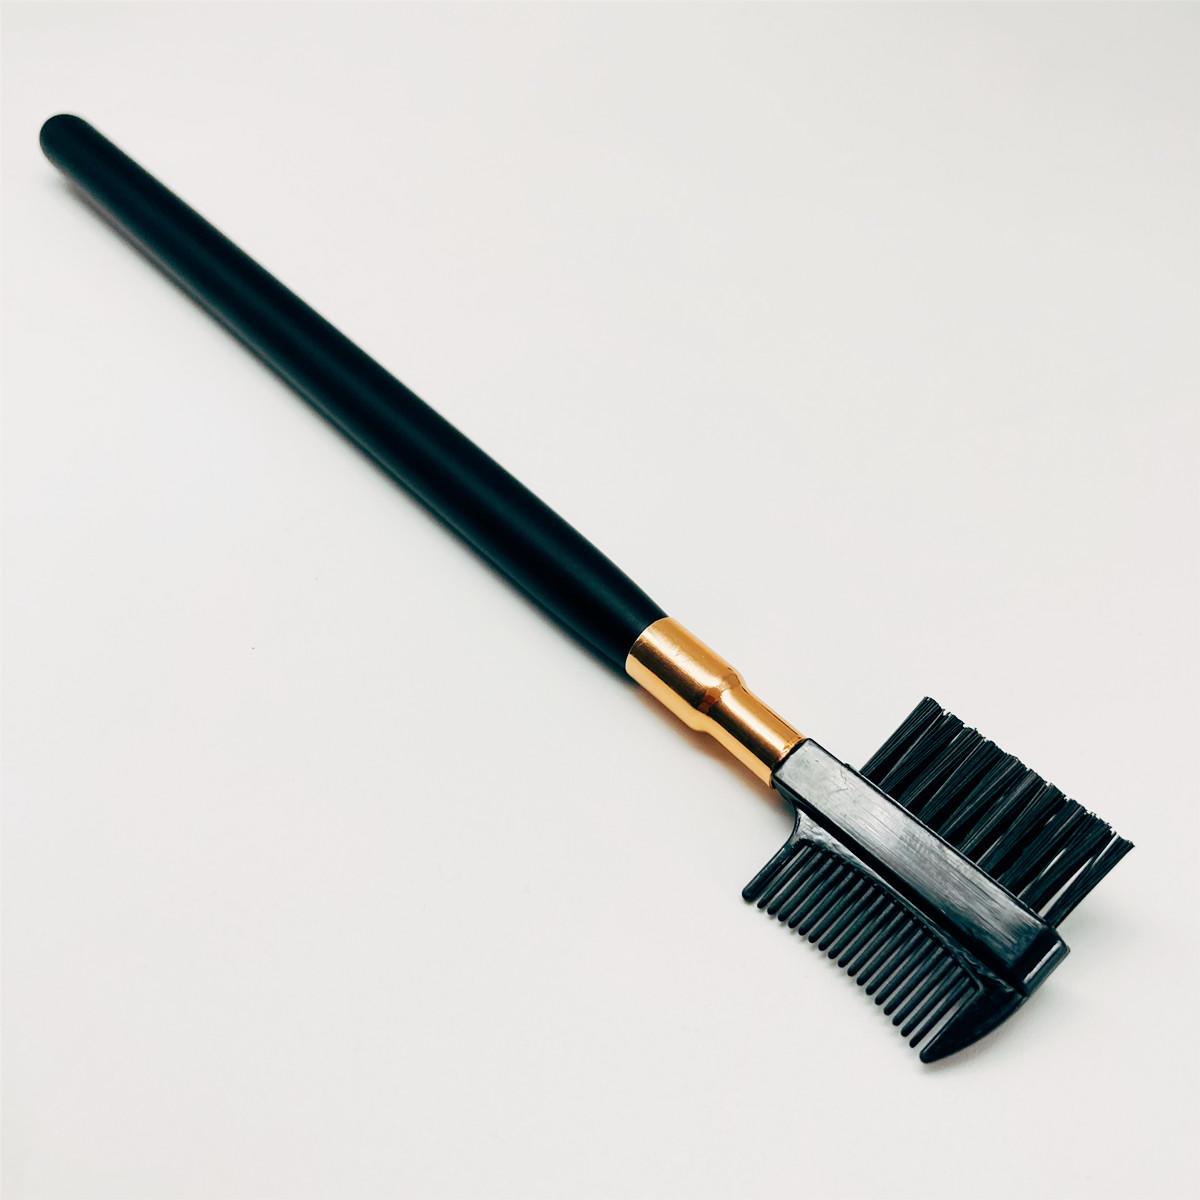 Spoolie and Comb dual spoolie and makeu pbrush Angle Brush and Spoolie